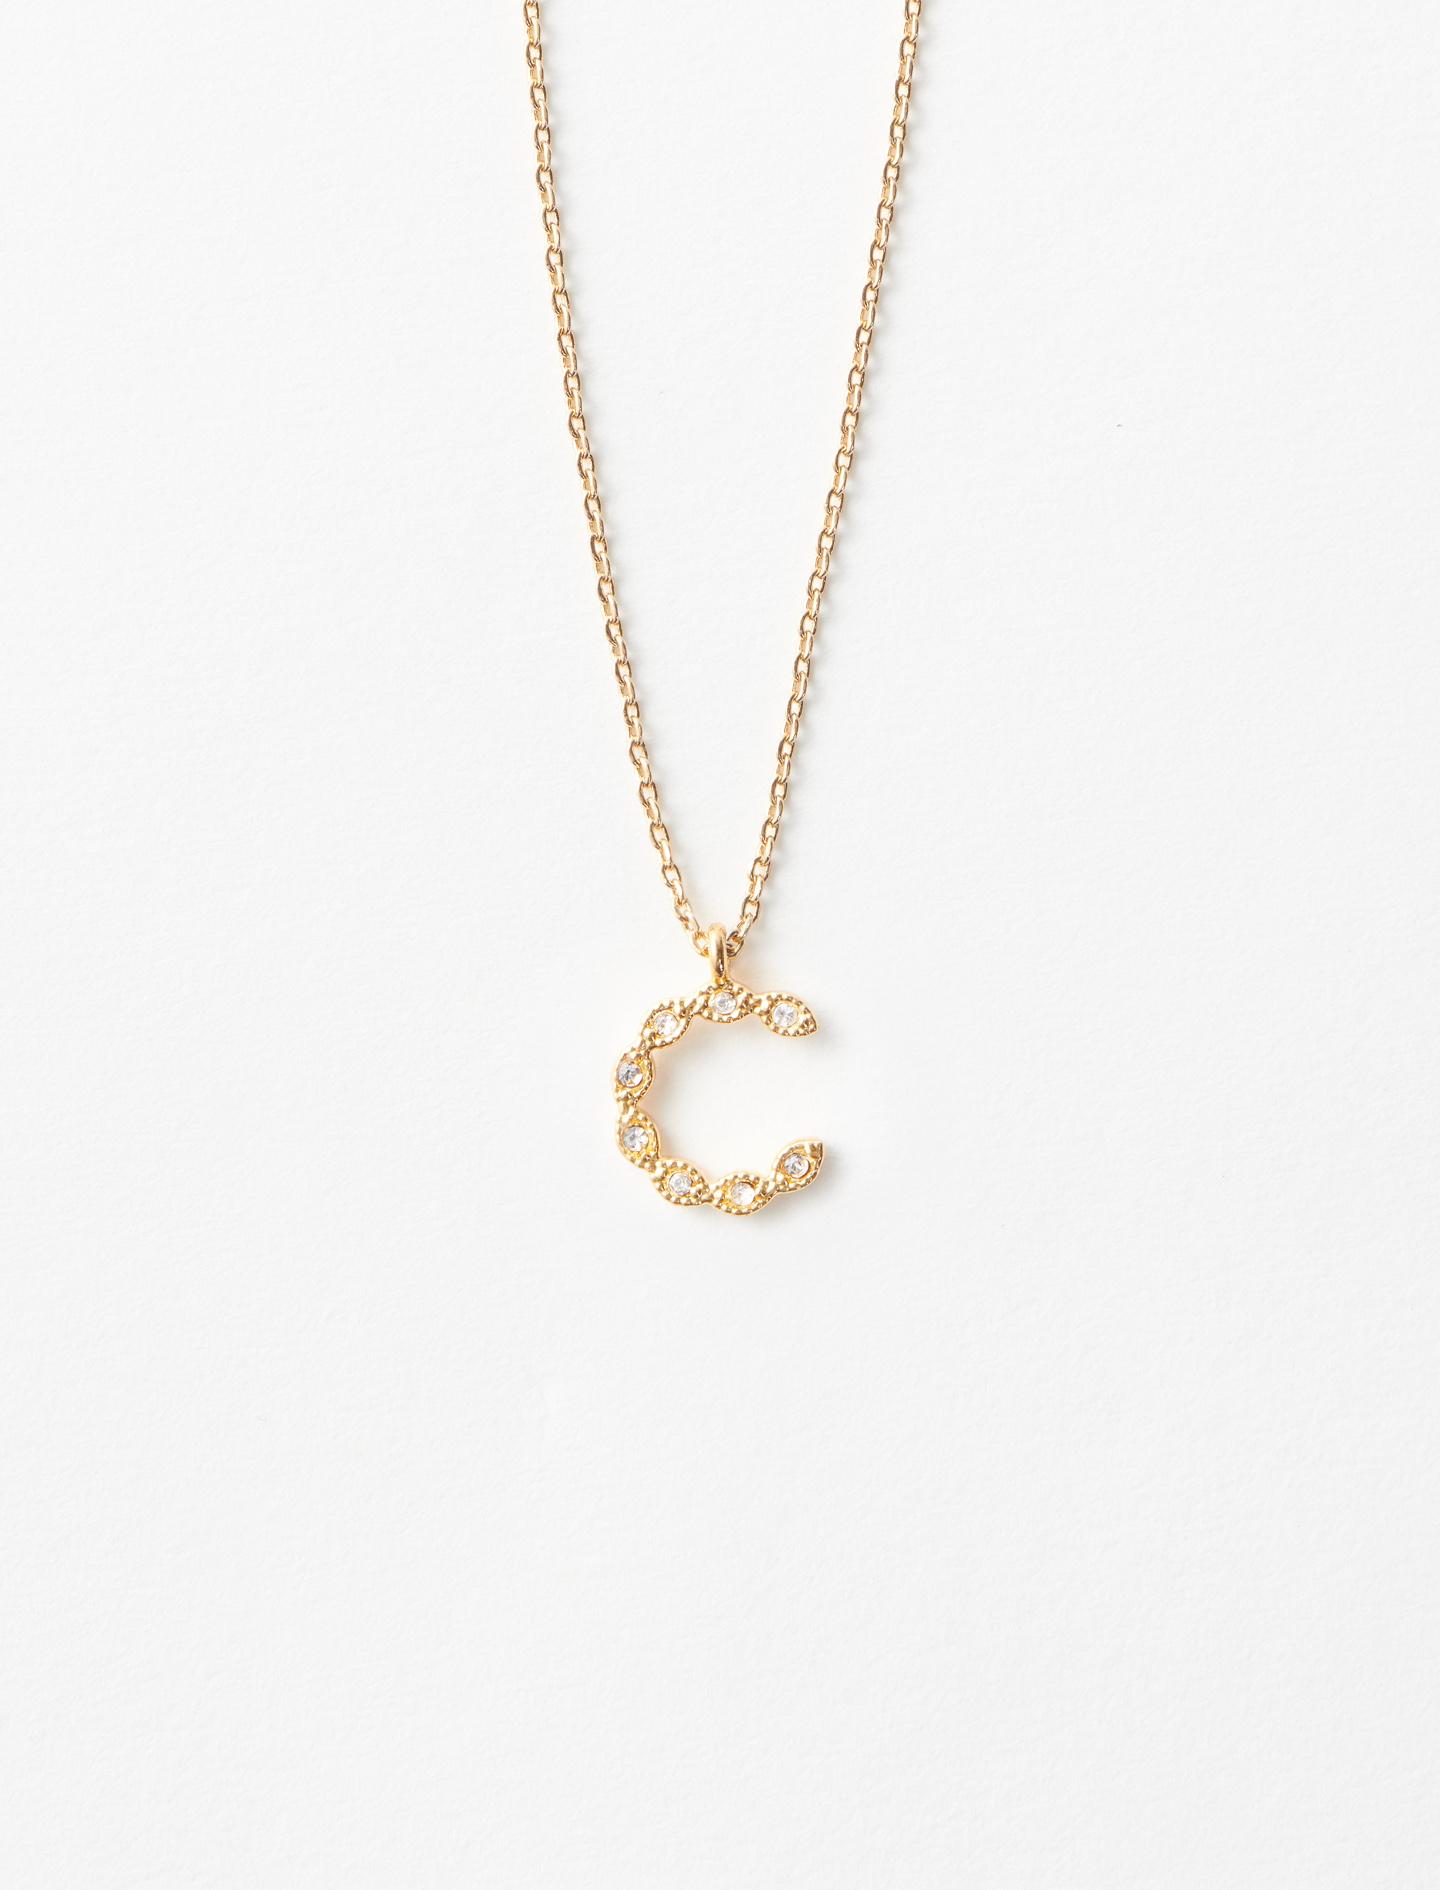 Rhinestone C necklace - Gold